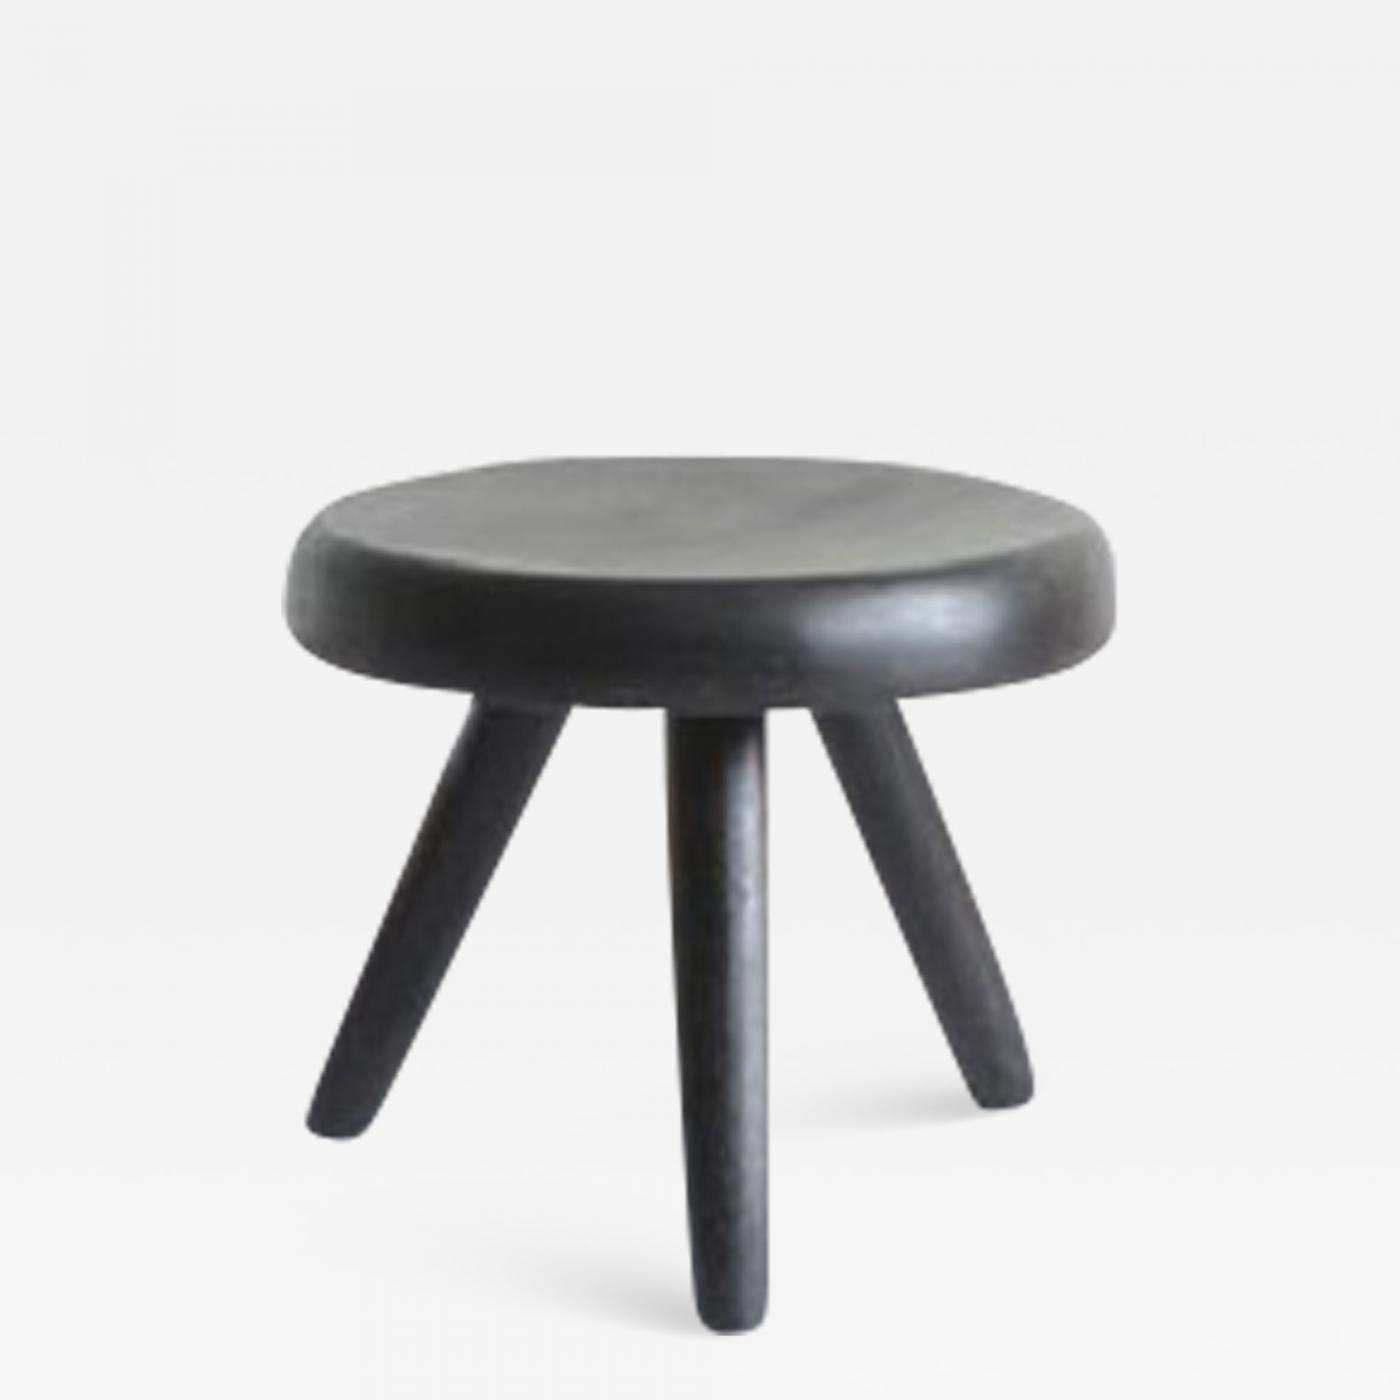 Enjoyable Pierre Jeanneret Charlotte Perriand Three Legged Stool Inzonedesignstudio Interior Chair Design Inzonedesignstudiocom